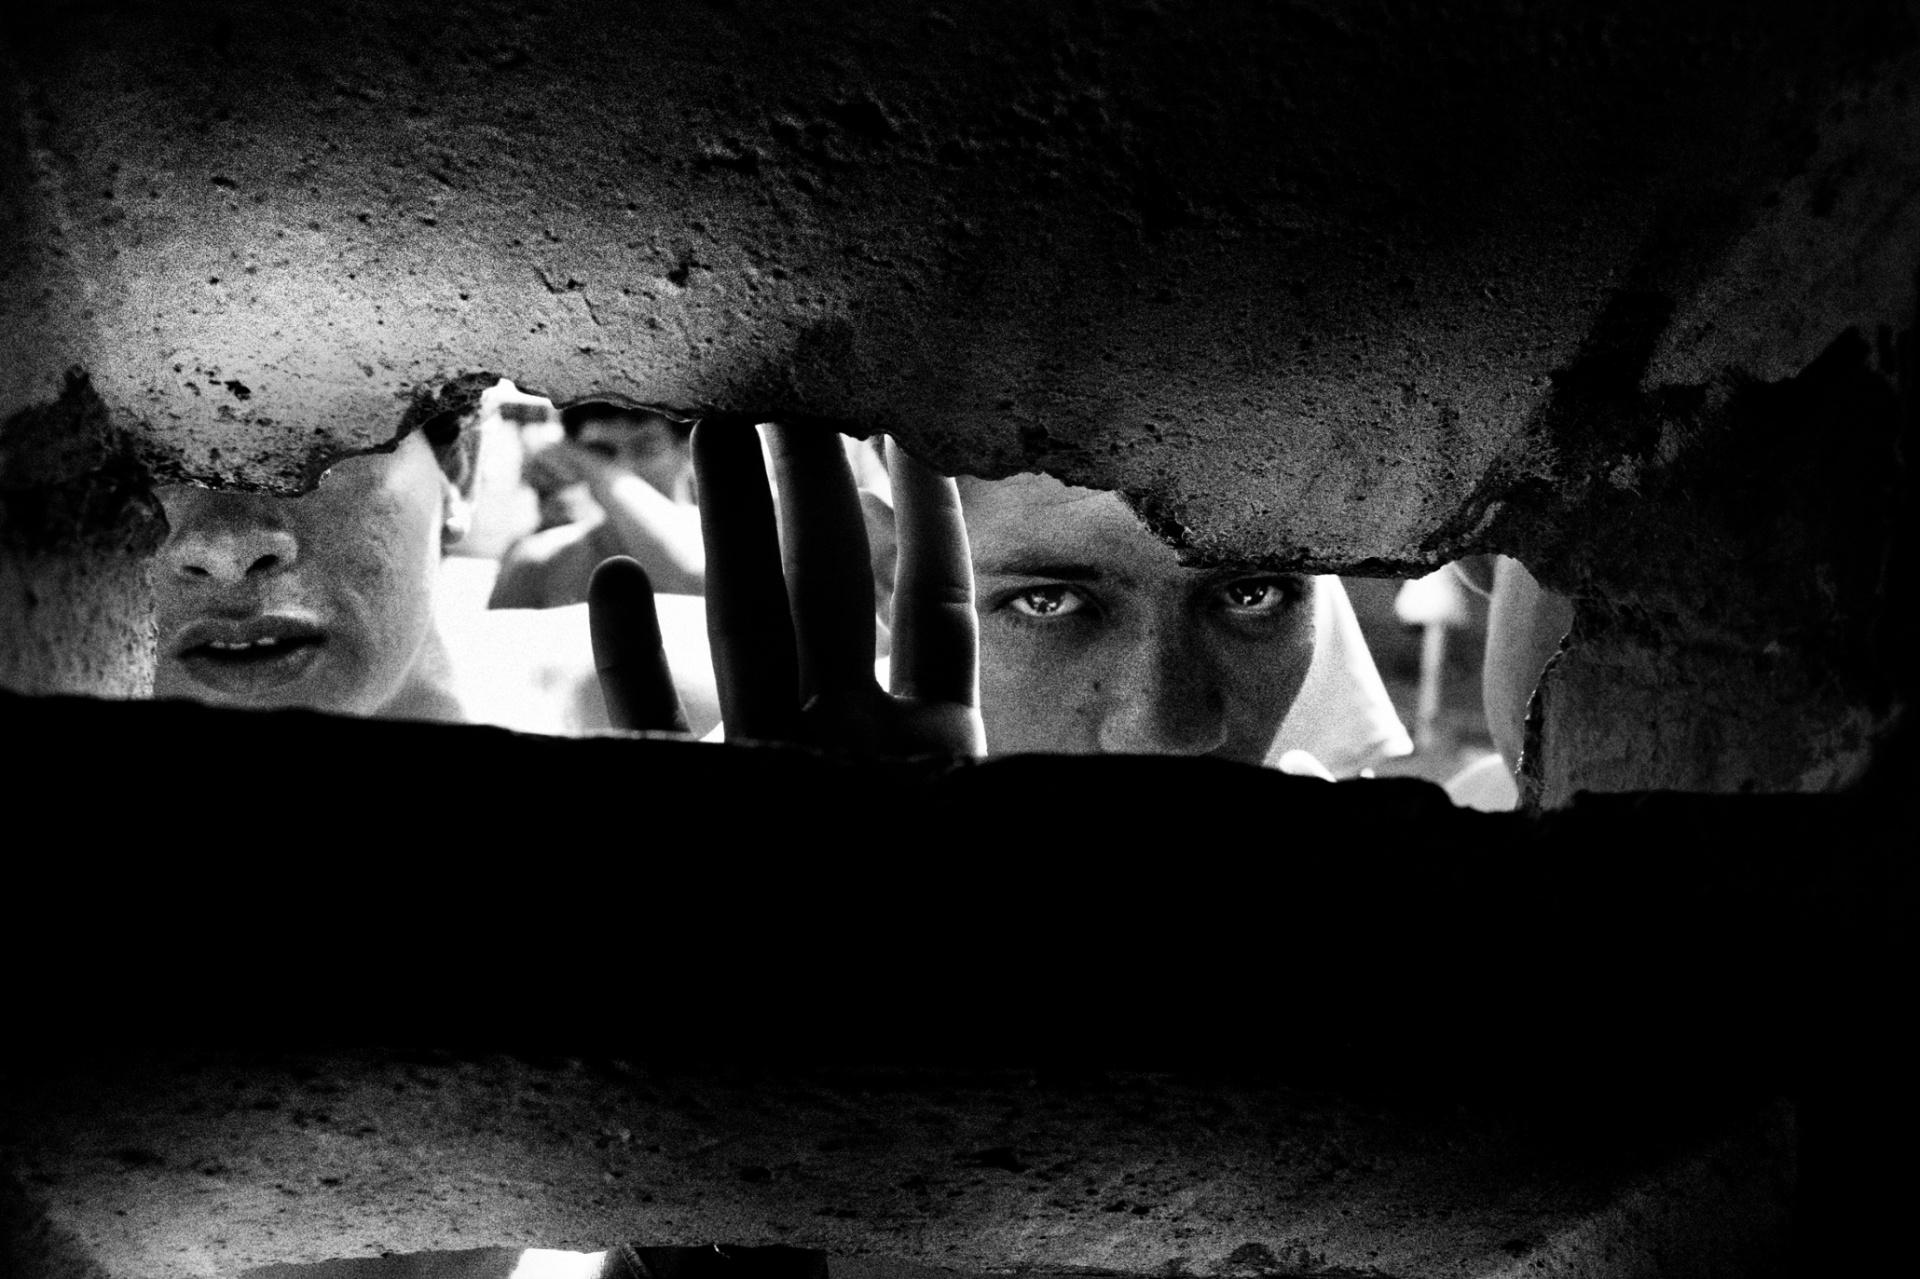 fotograf Valerio Bispuri 1